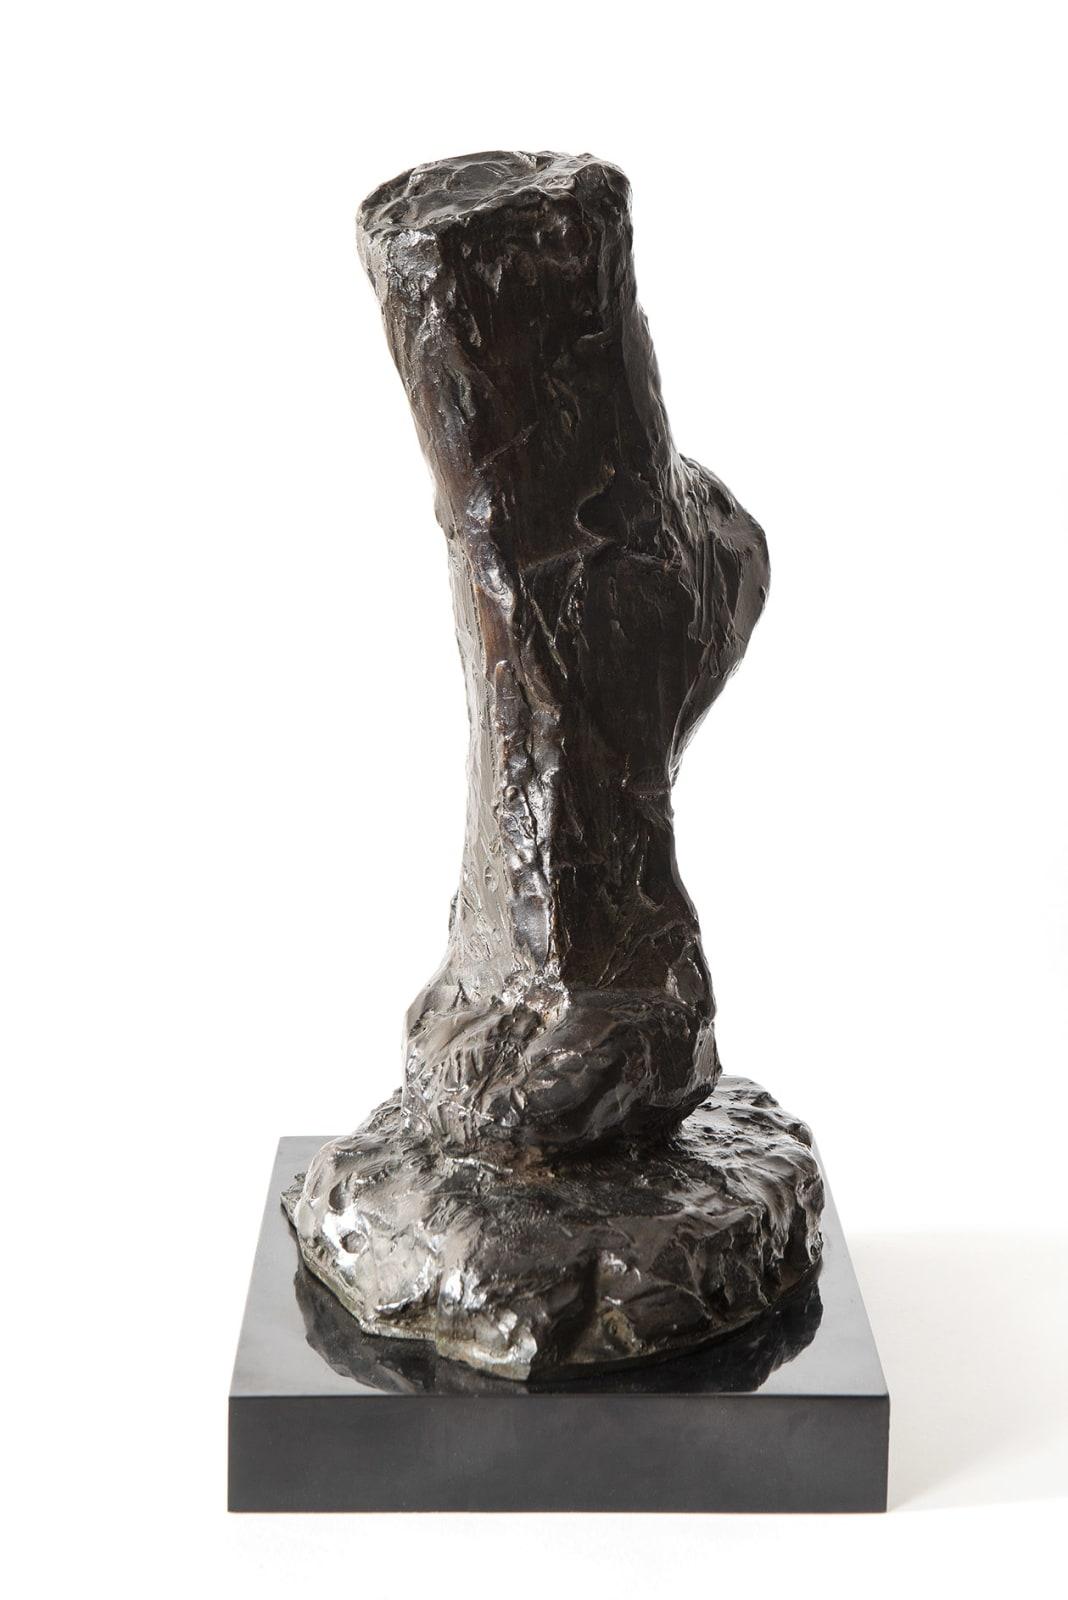 HENRI MATISSE, Le pied, 1952